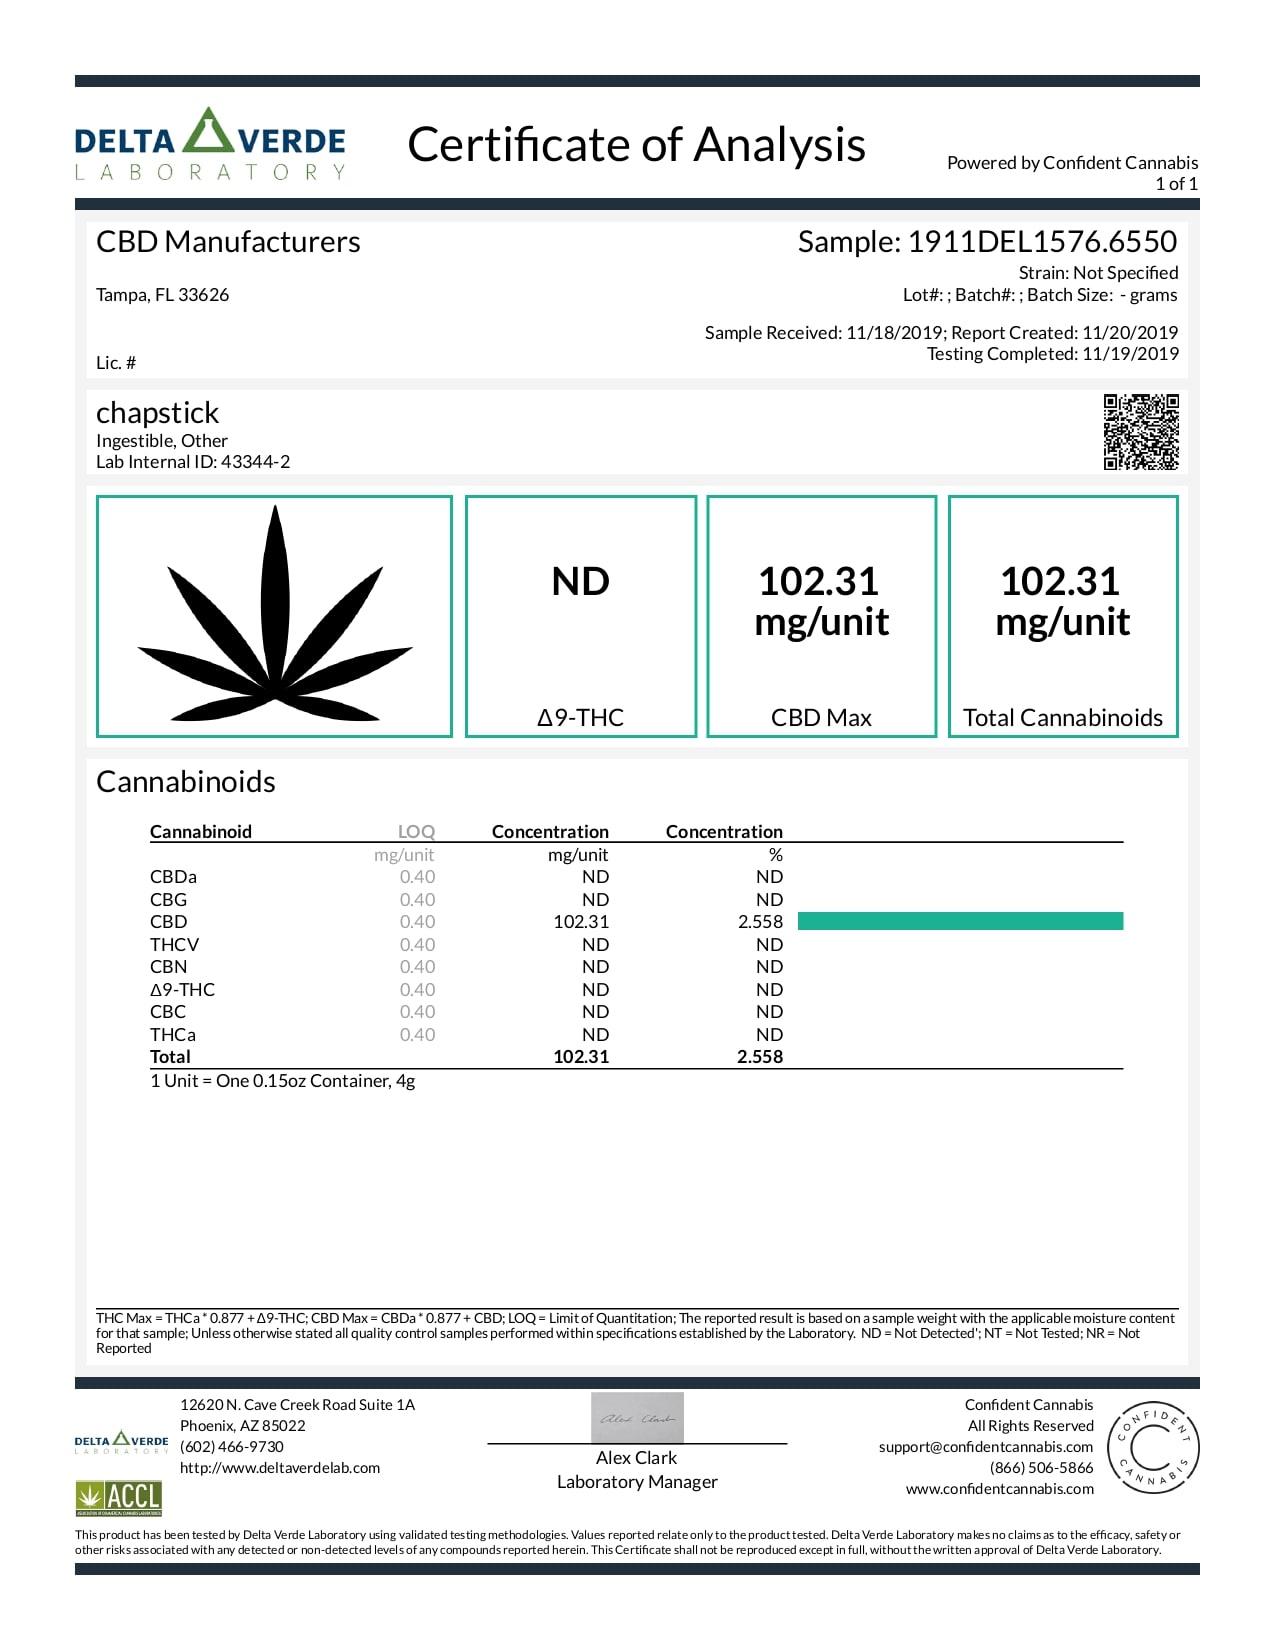 Avid Hemp CBD Topical Chapstick Peppermint Lab Report